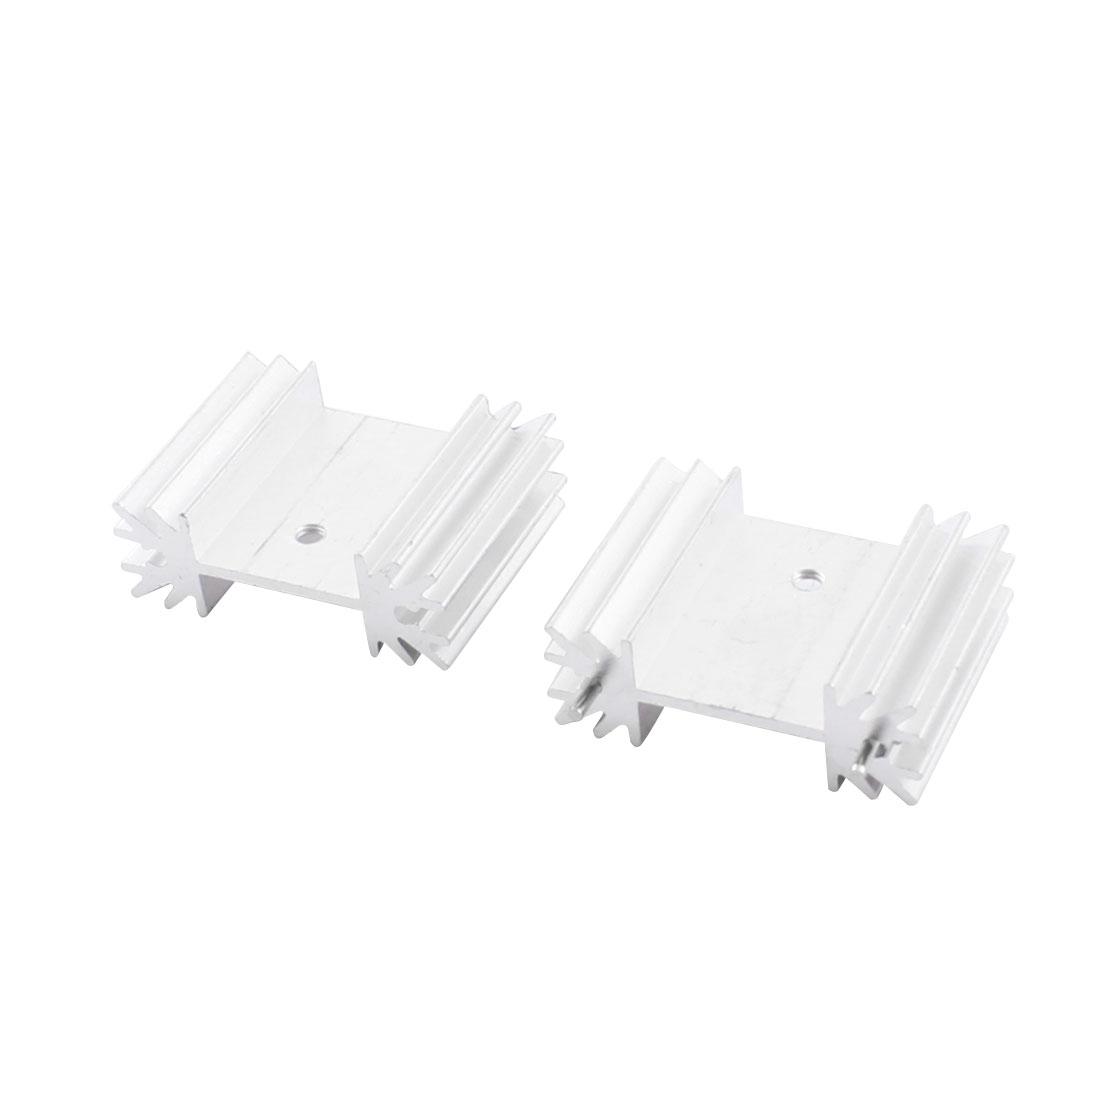 PCB Board Parts Aluminium Radiator Fin Cooling Cooler Heatsink Heat Sink 34mmx12mmx25mm 2Pcs + Needle